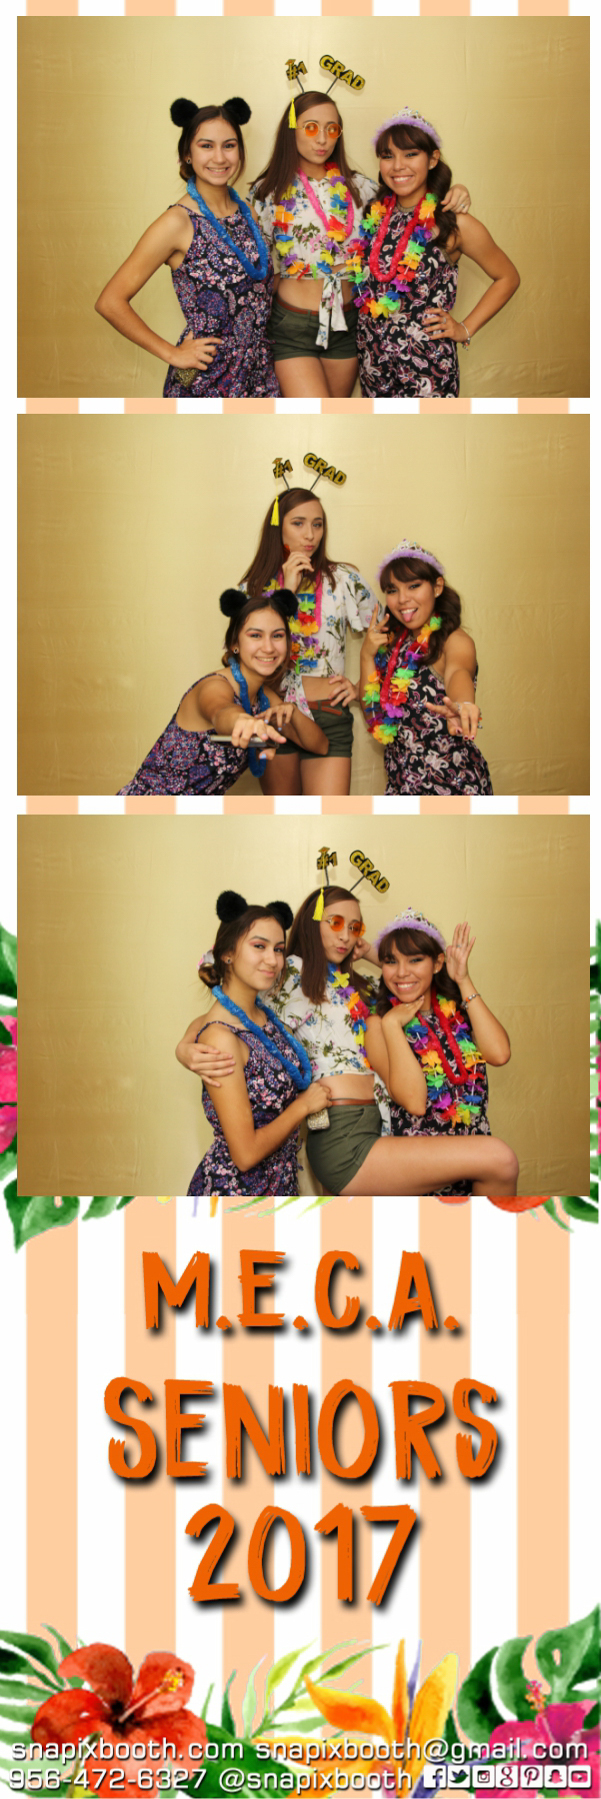 MECA Senior Party 2017